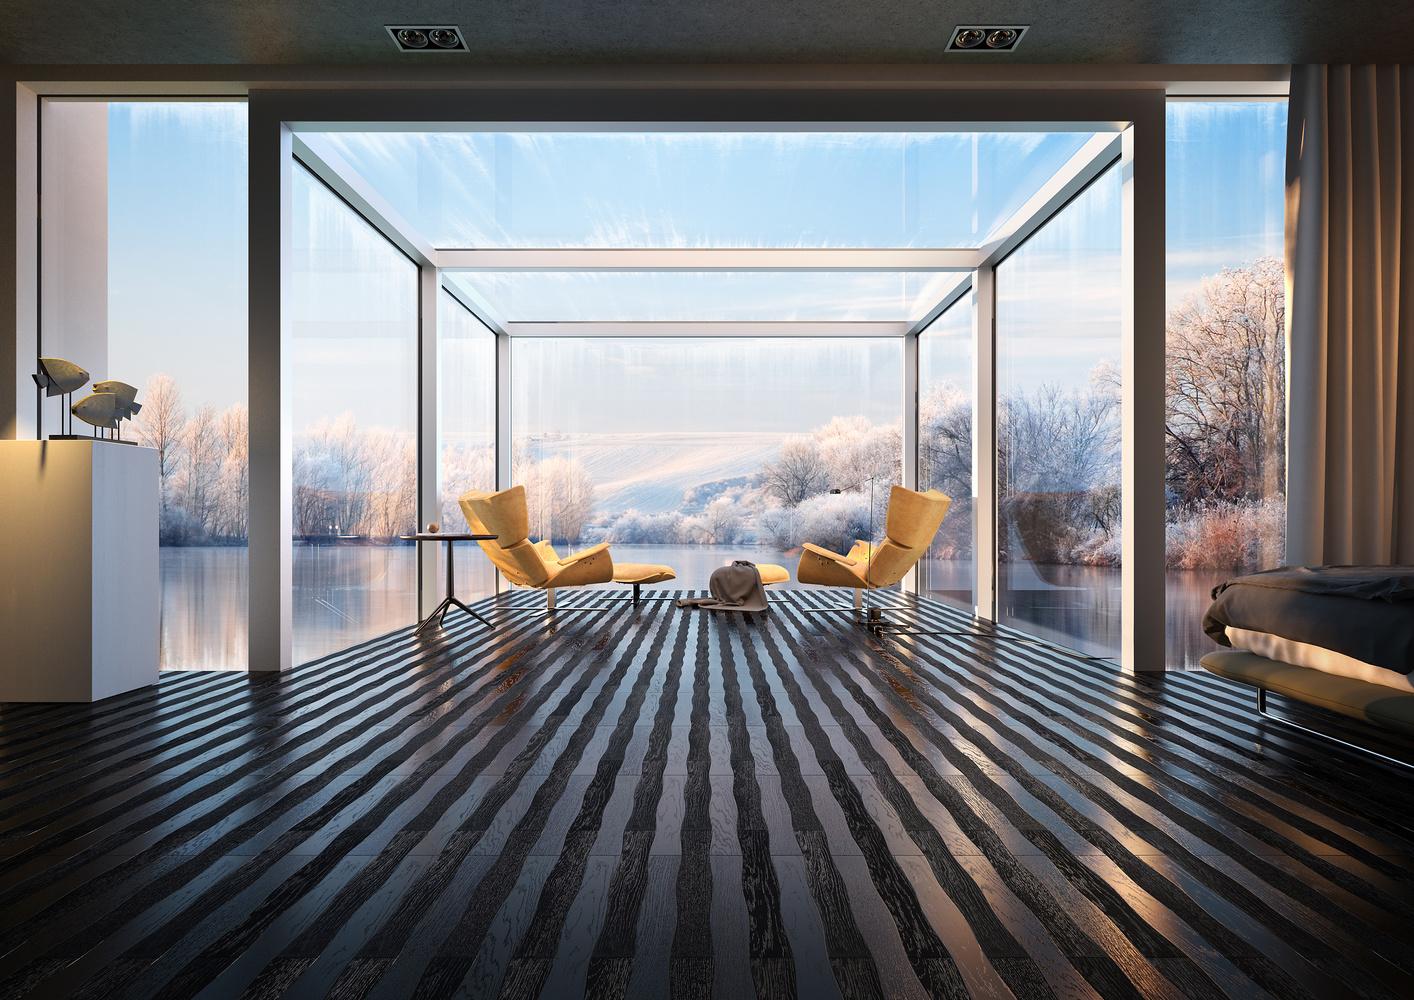 Lake House in Winter by Francesco Fusina